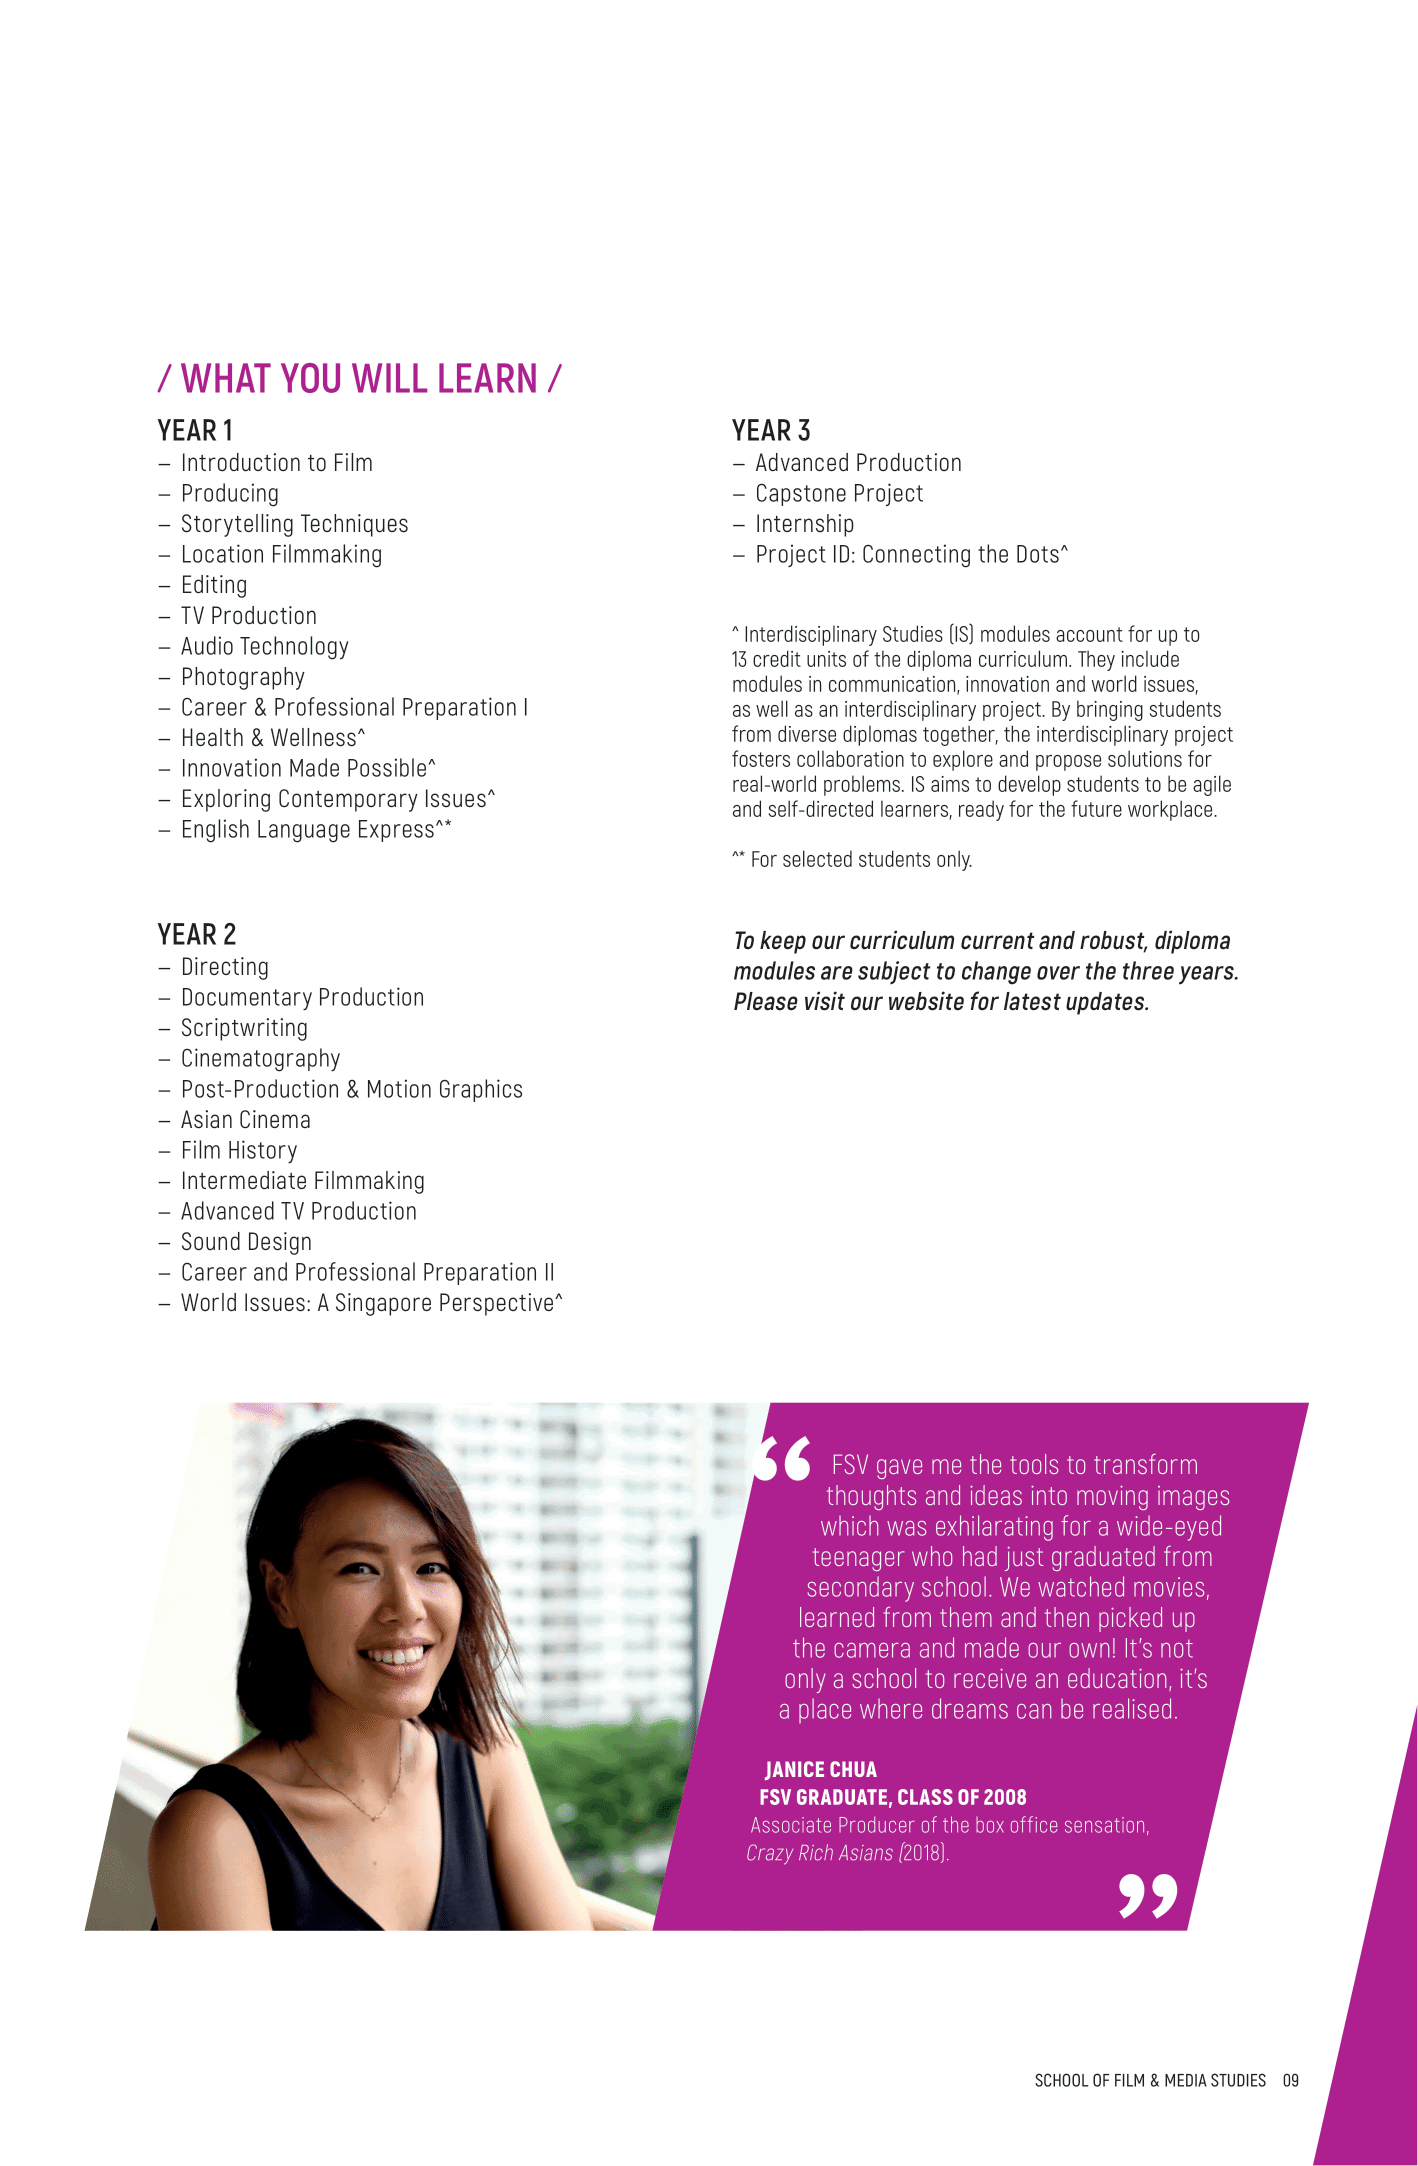 School of Film and Media Studies 2020-11